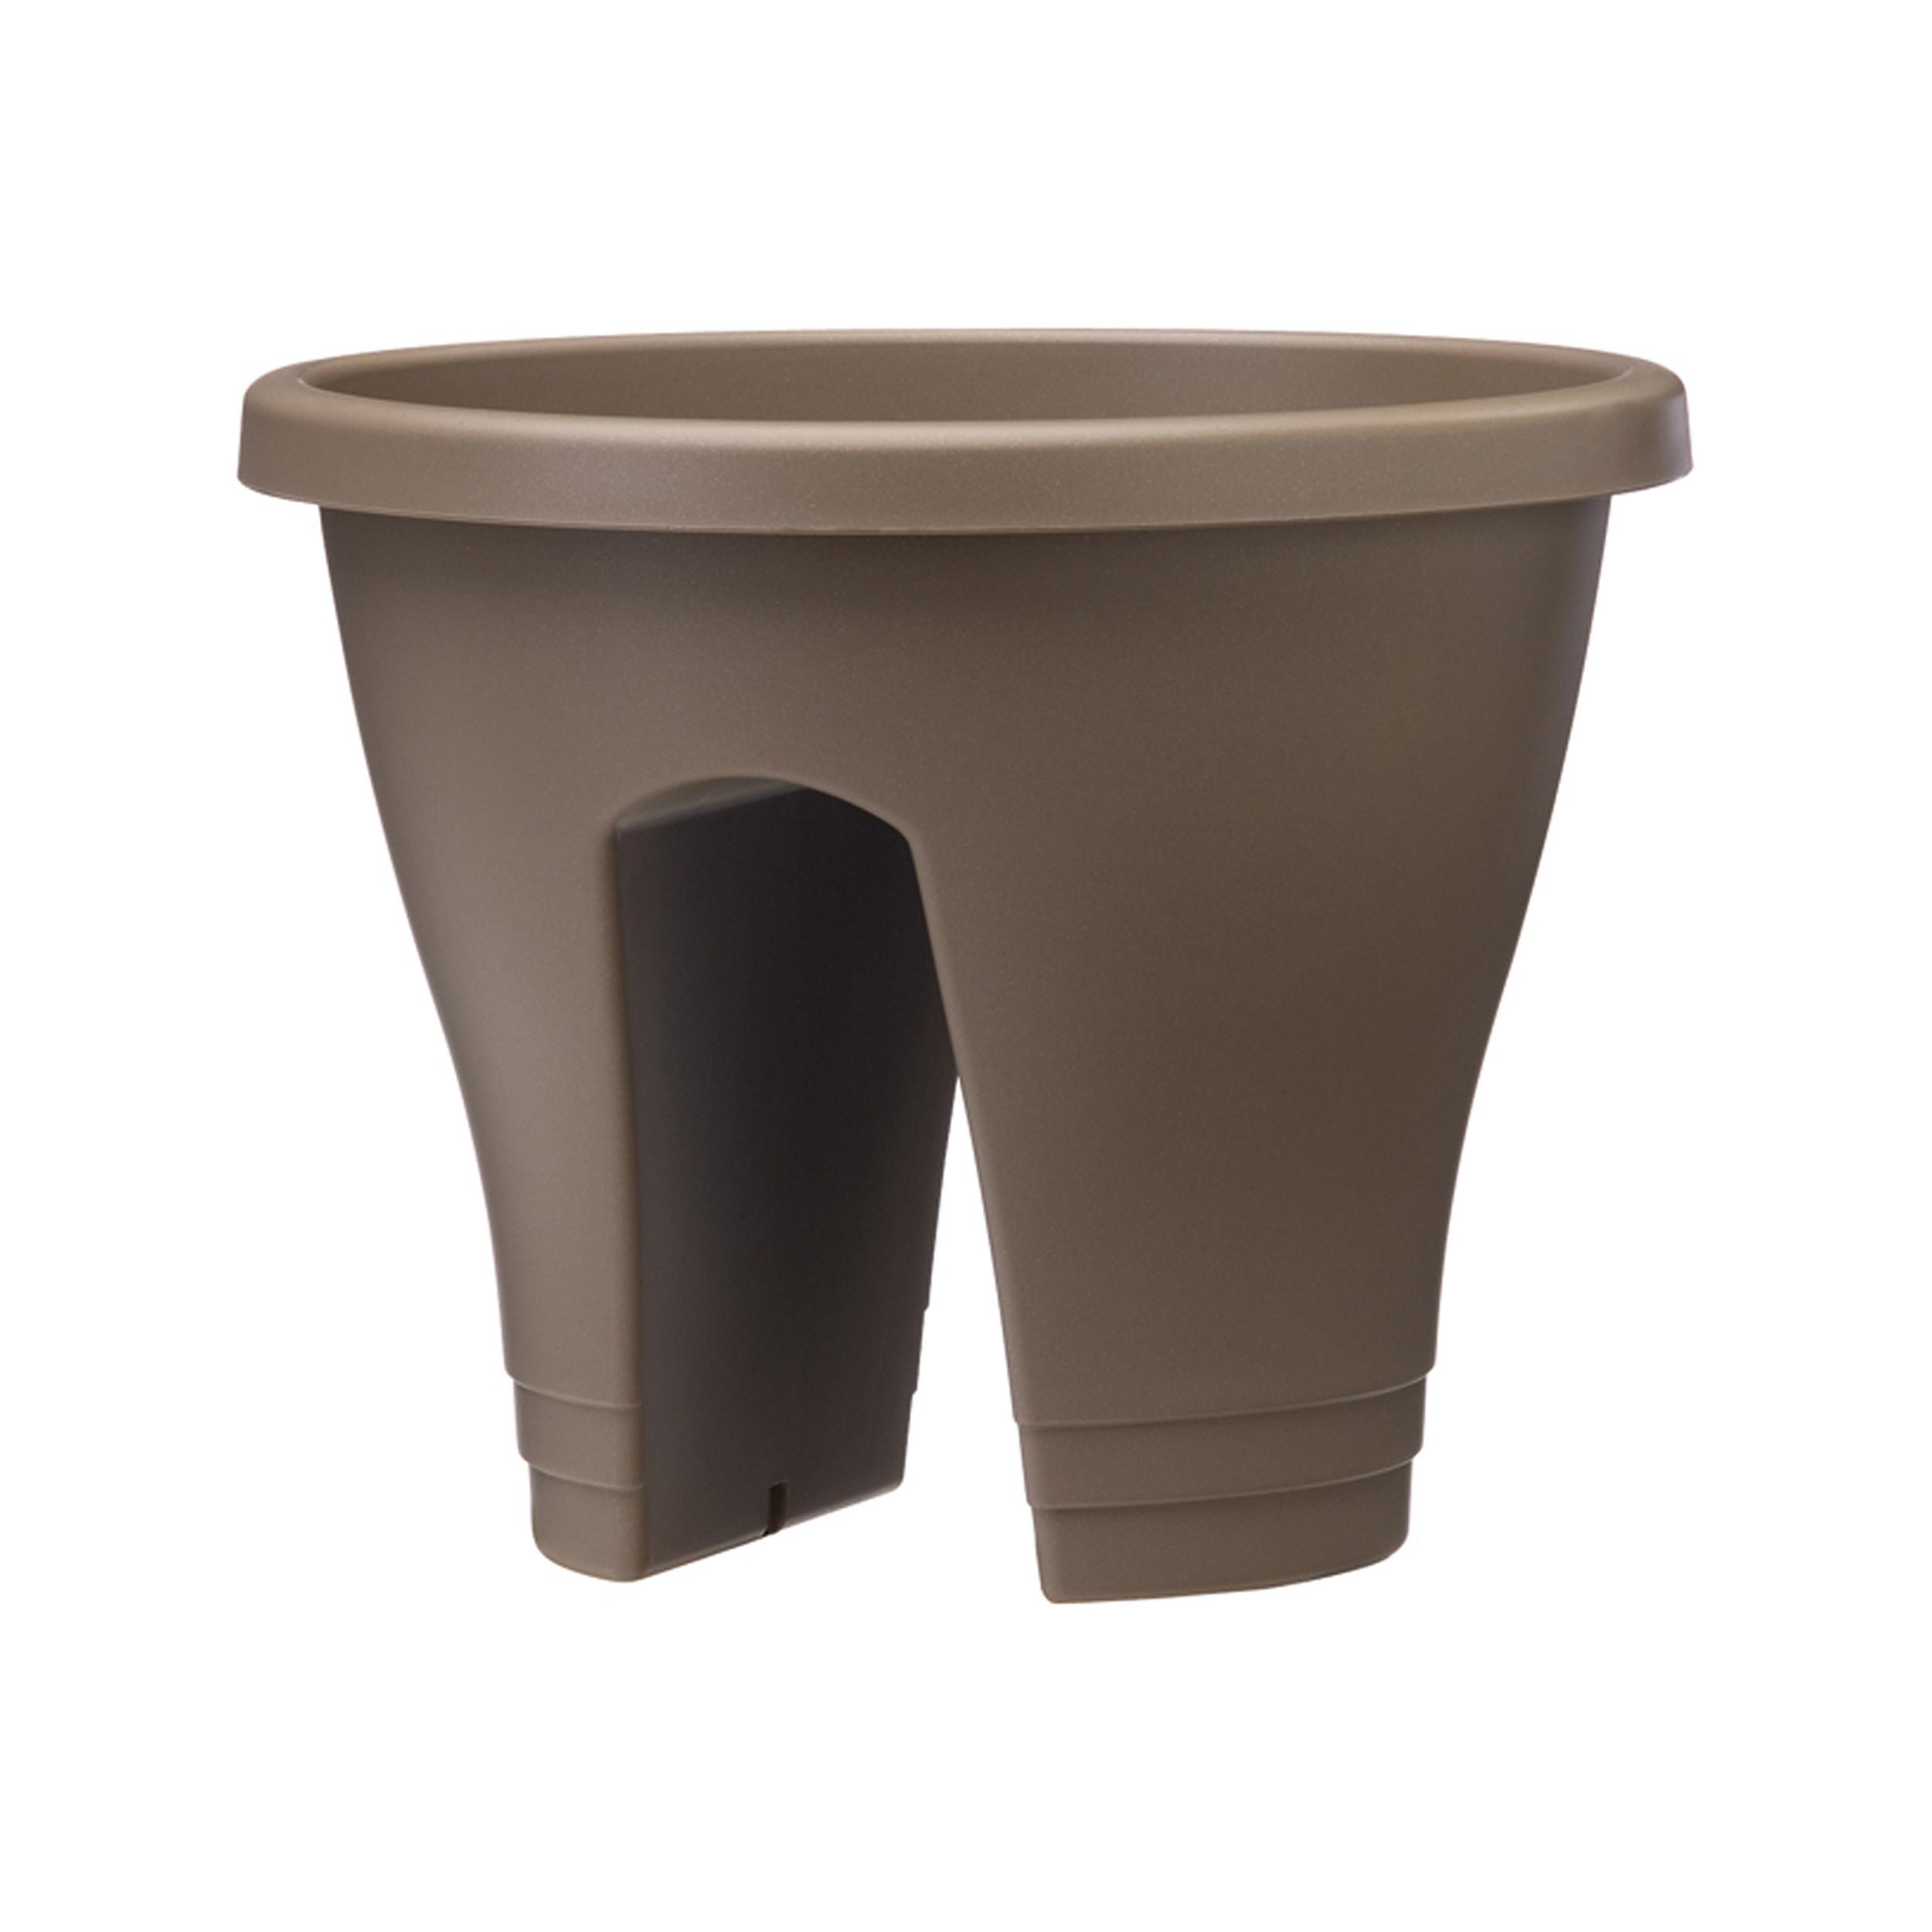 pflanzgef corsica flower bridge d30cm. Black Bedroom Furniture Sets. Home Design Ideas